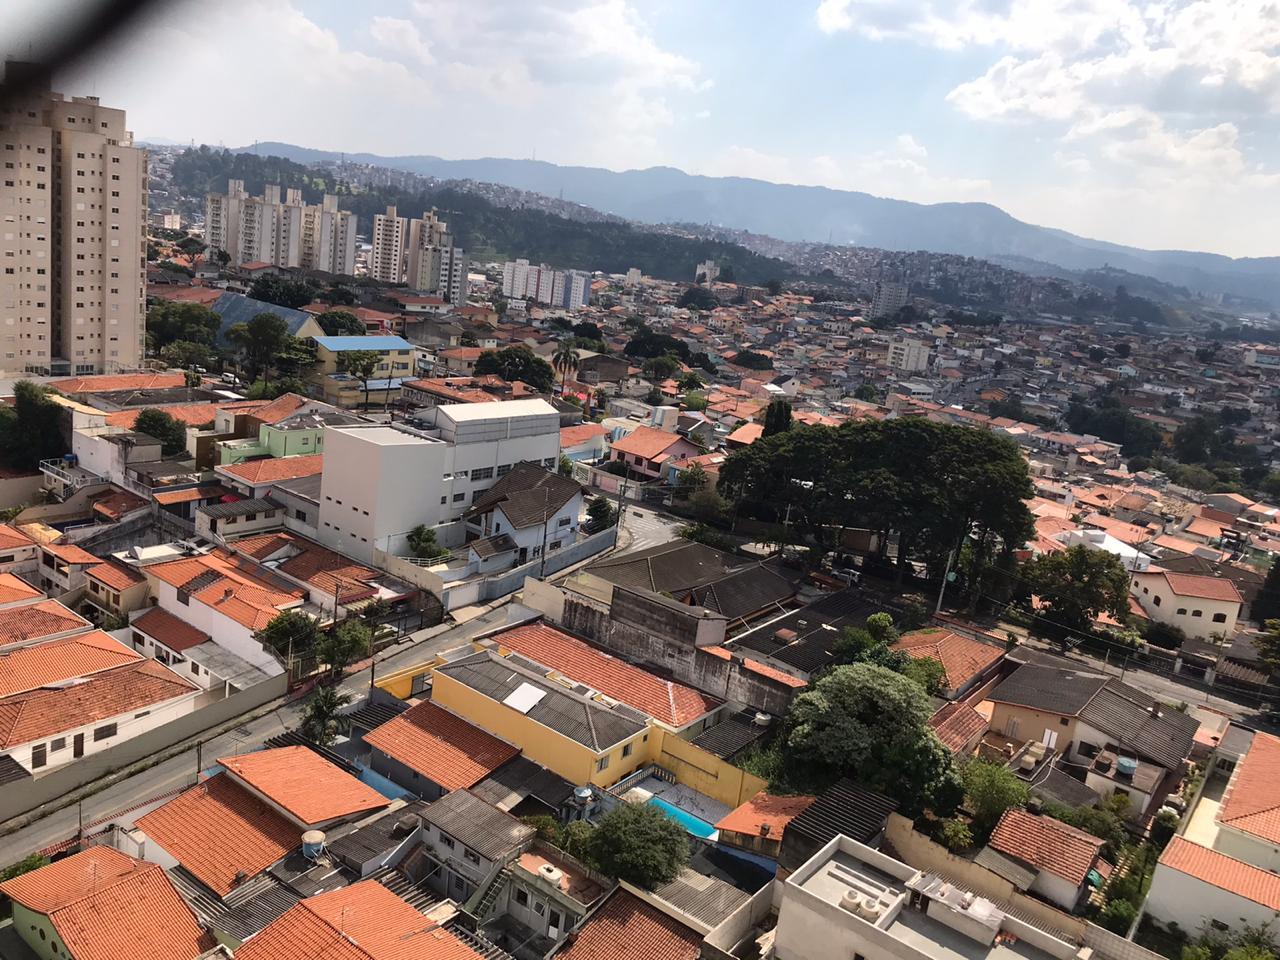 Zé Luiz, Guarulhos, 2020.